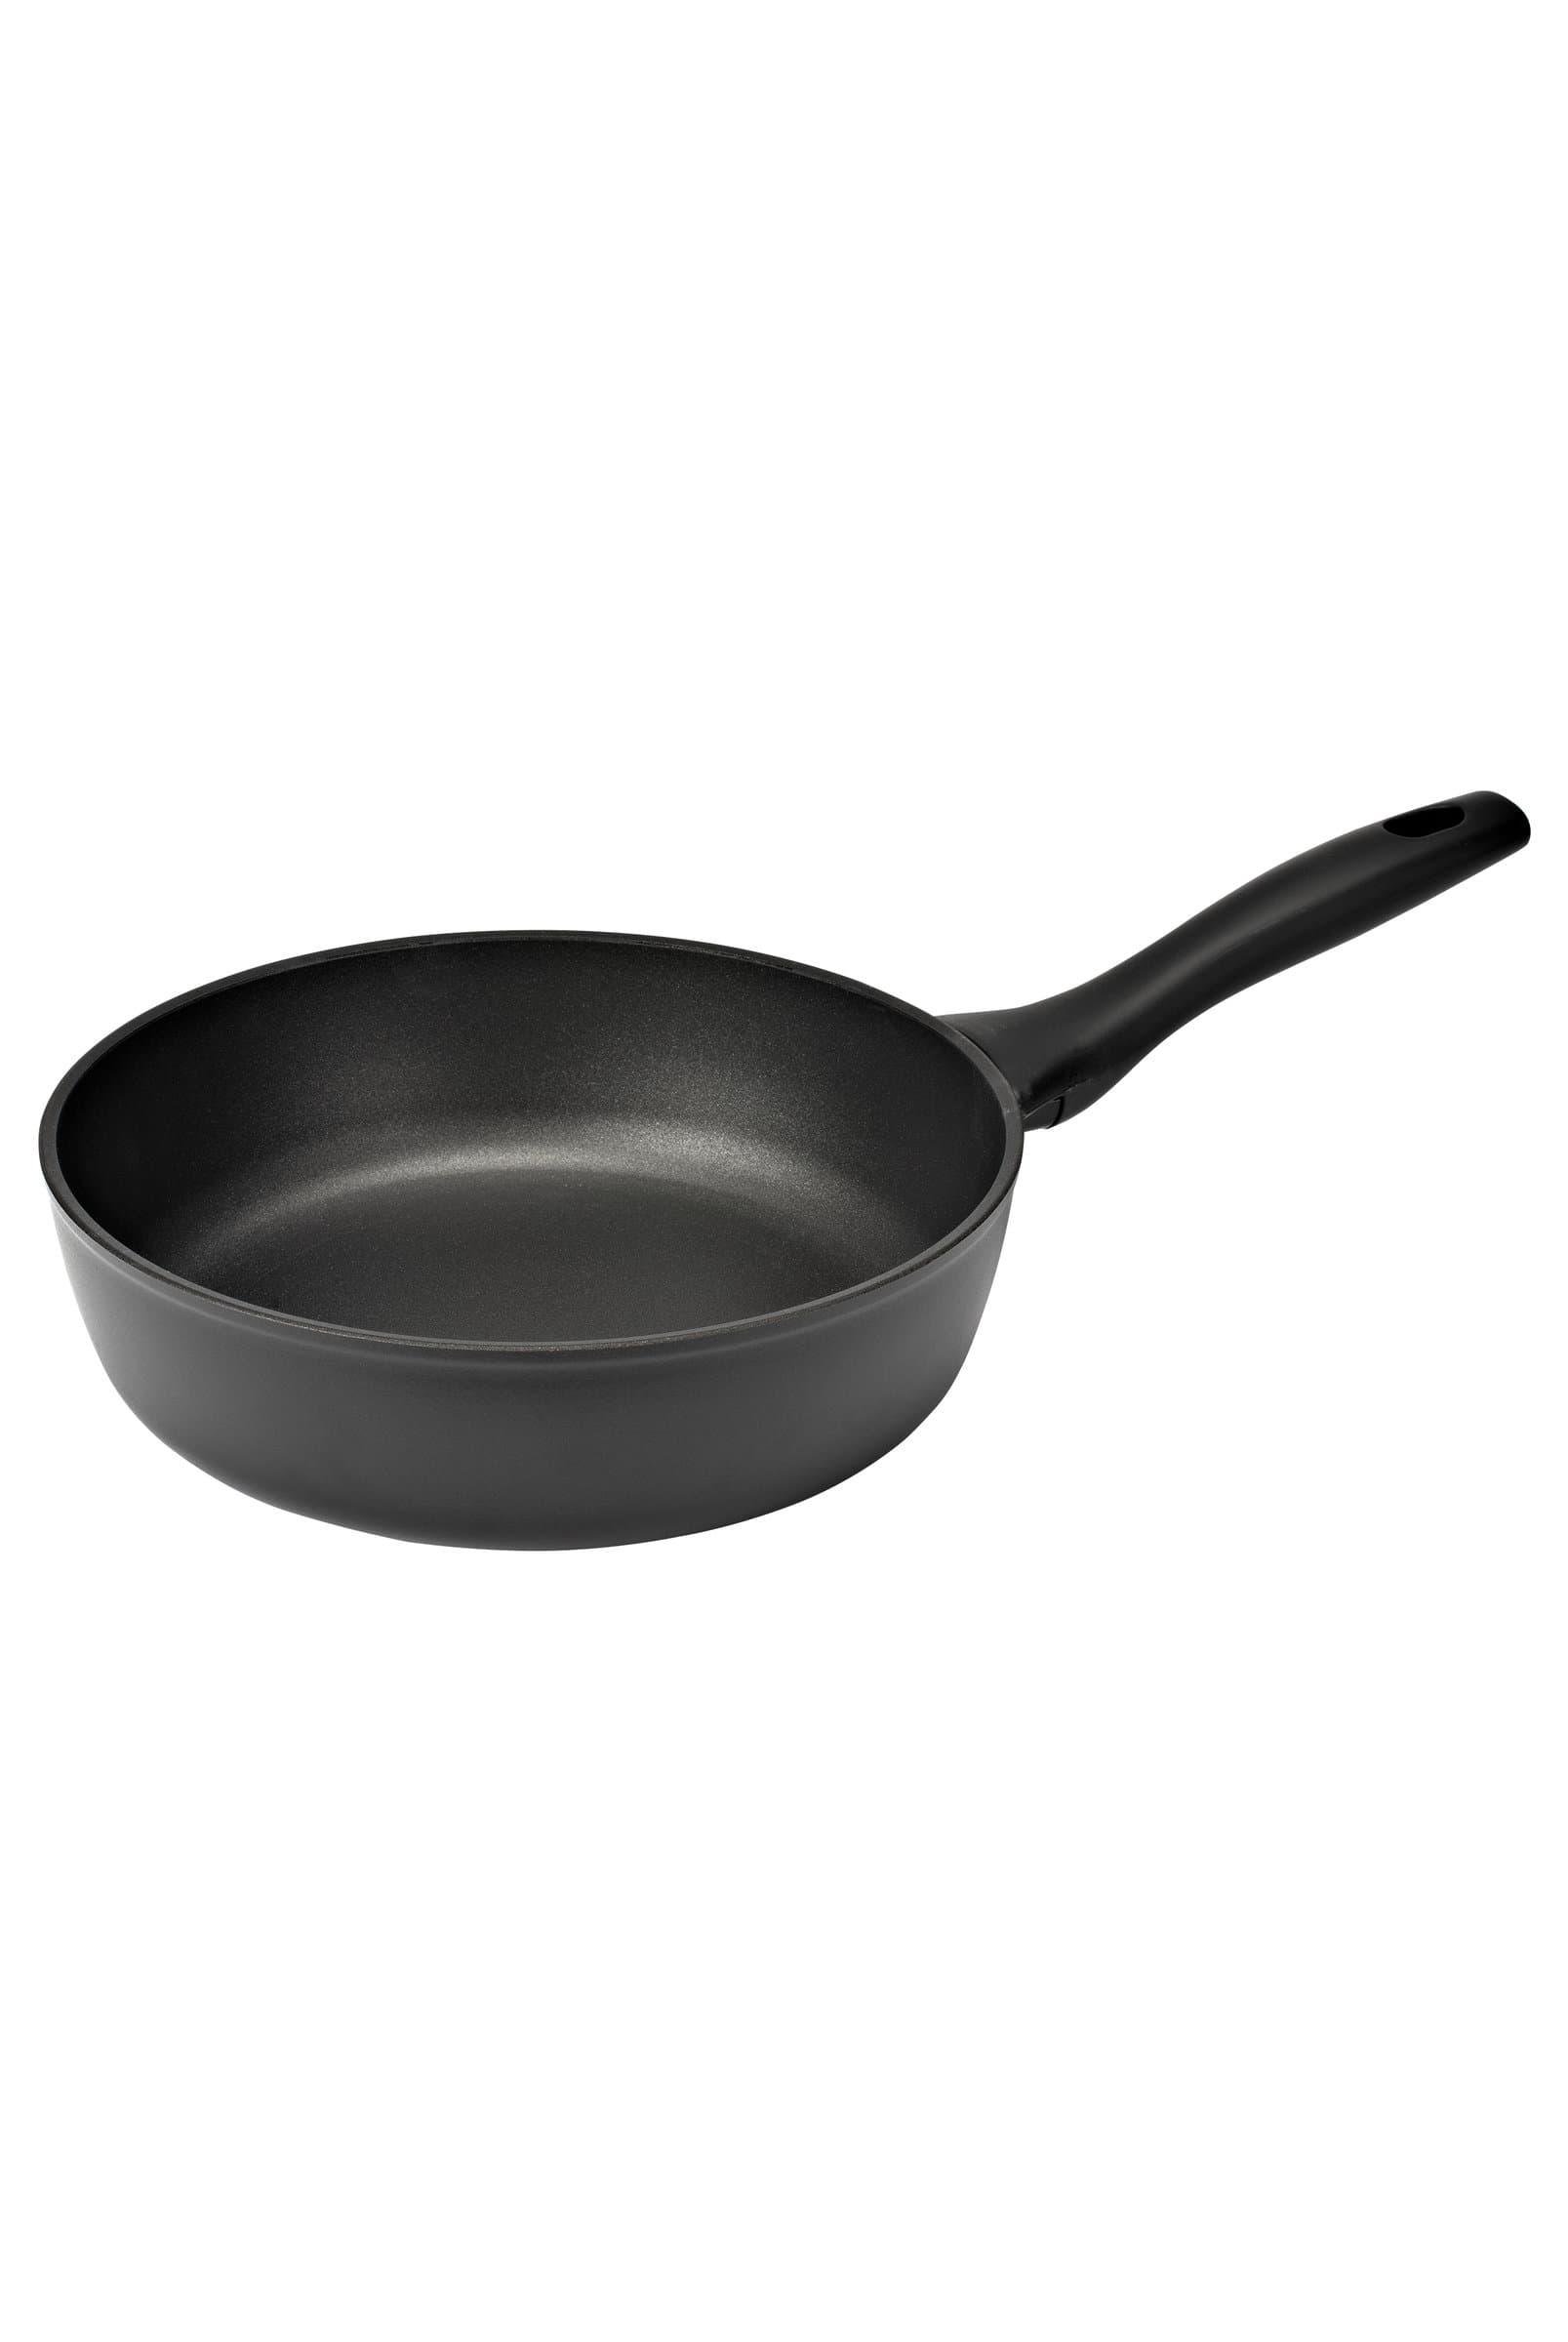 Cucina & Tavola Poêle 24cm high